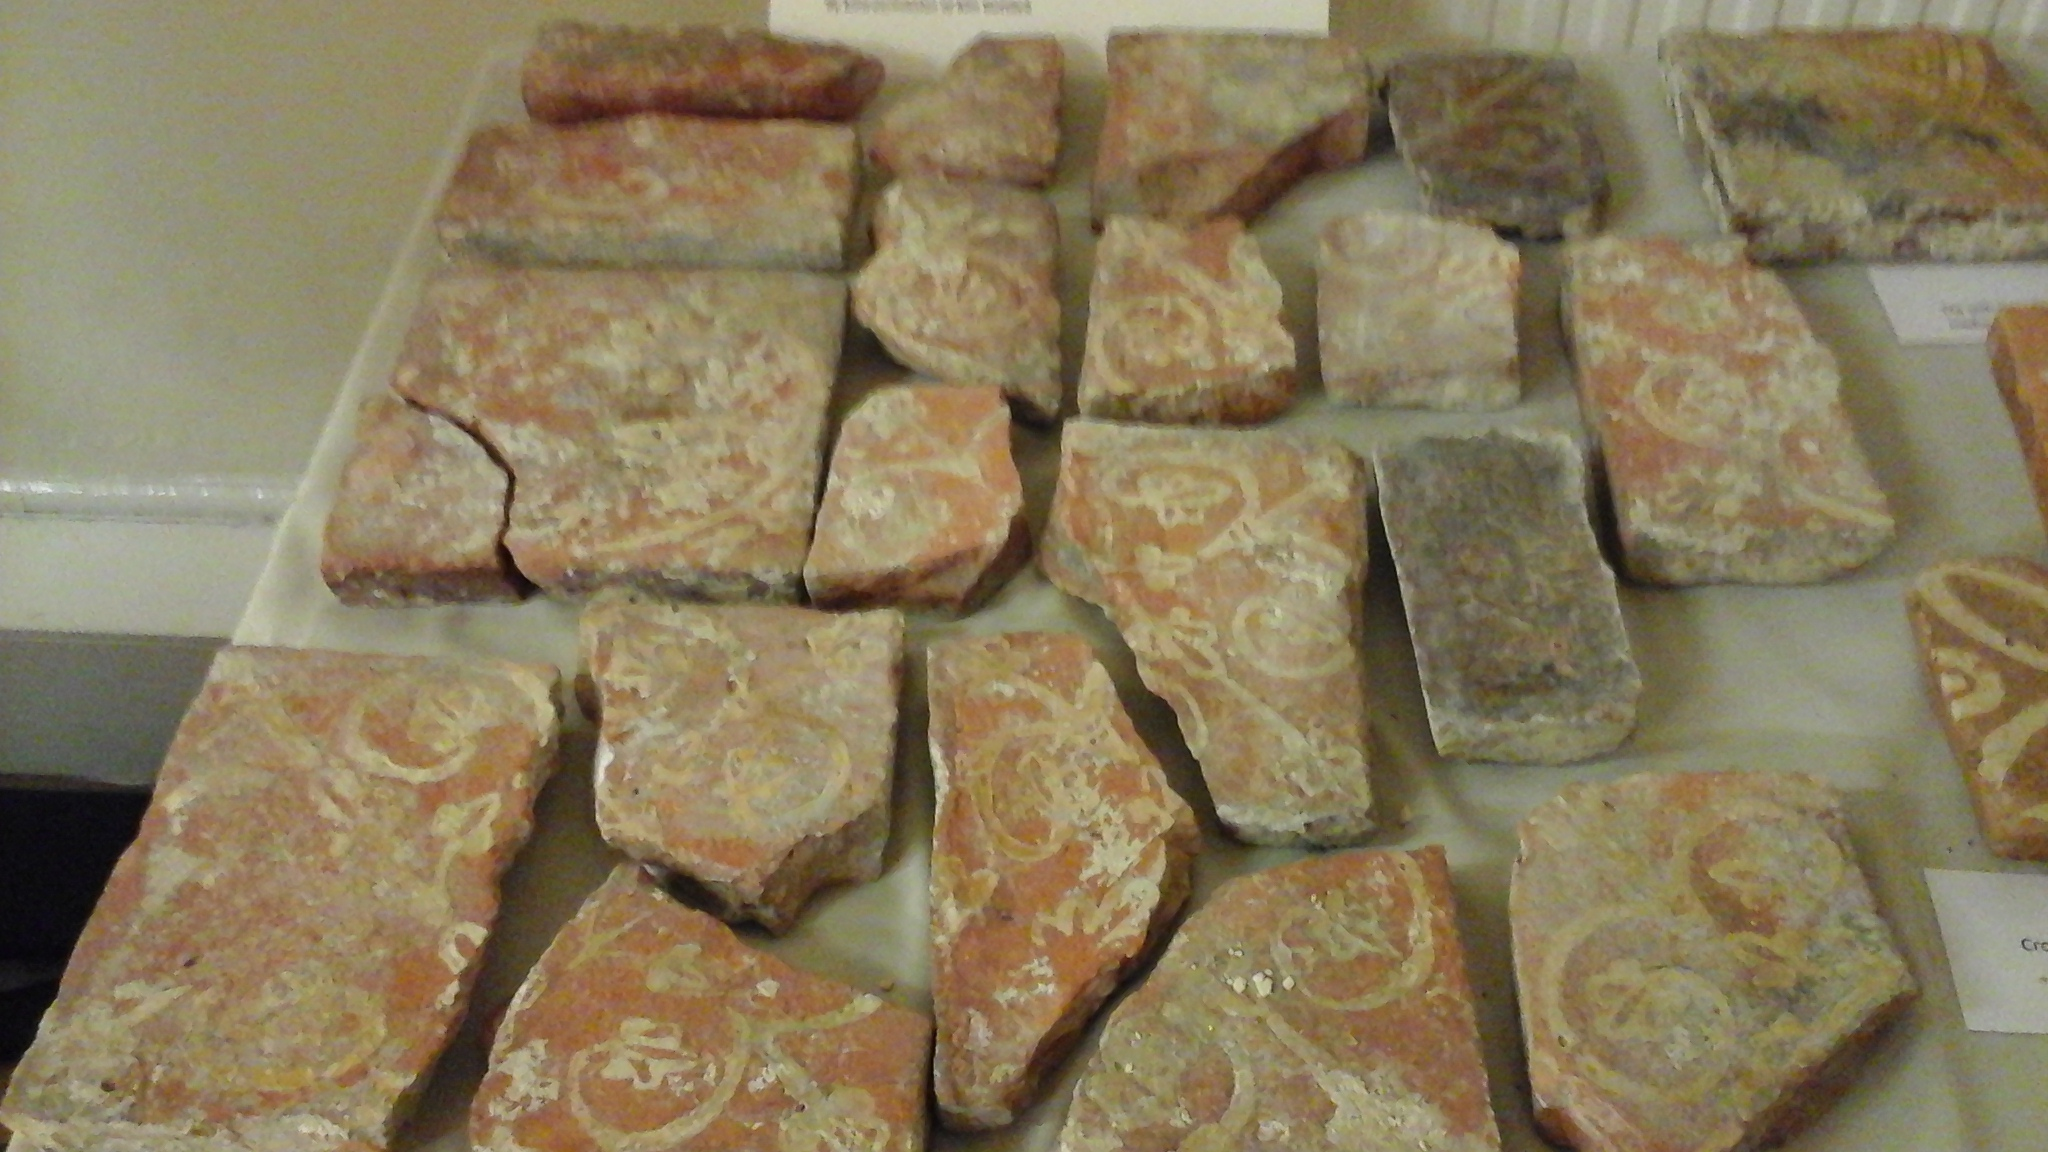 14th century tiles